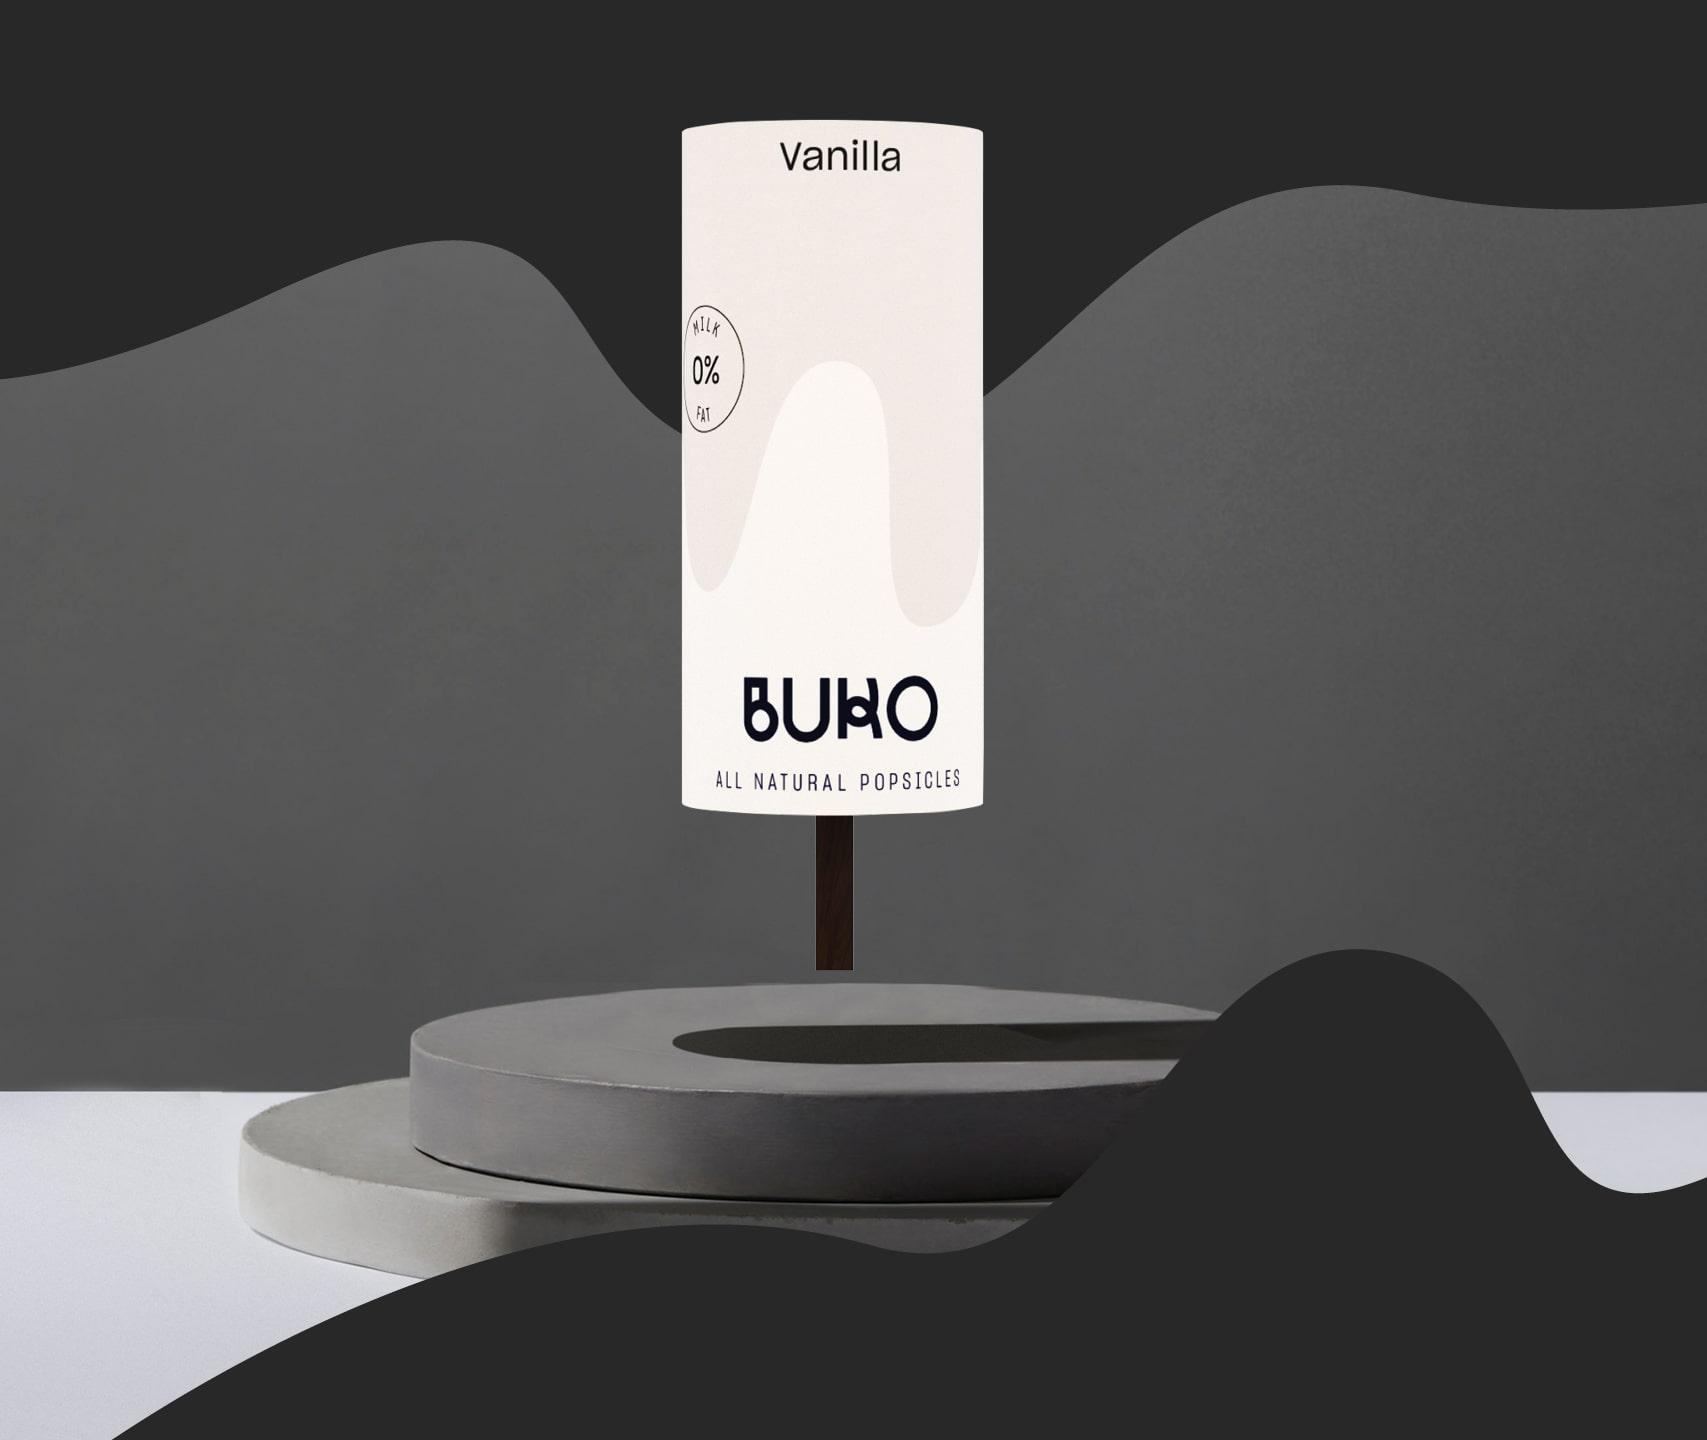 mantik-digital-creative-agency-branding-popsicle-icecream-packaging-experience-web-design-development22-min